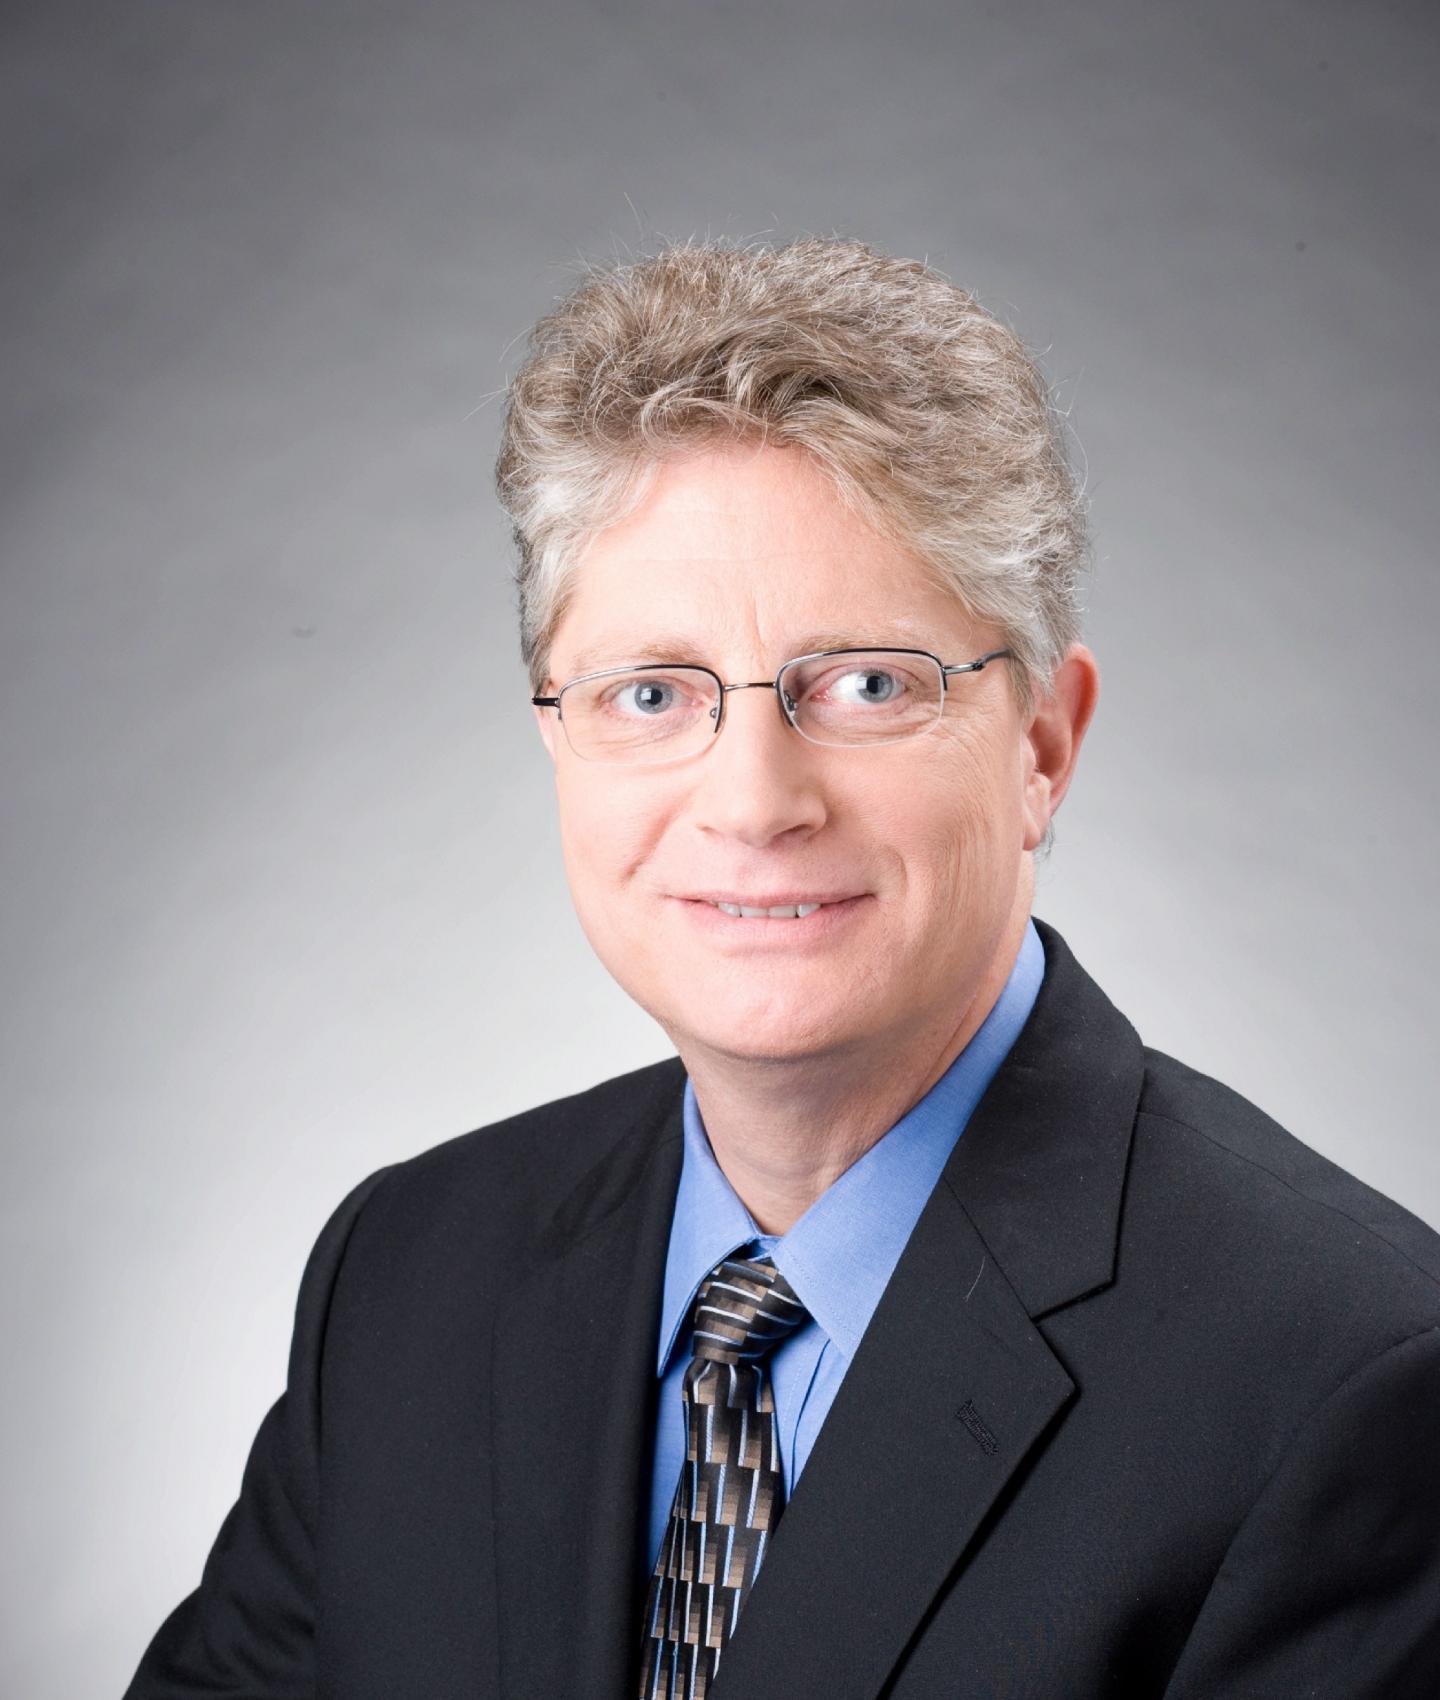 Daniel Clauw, M.D., University of Michigan Health System